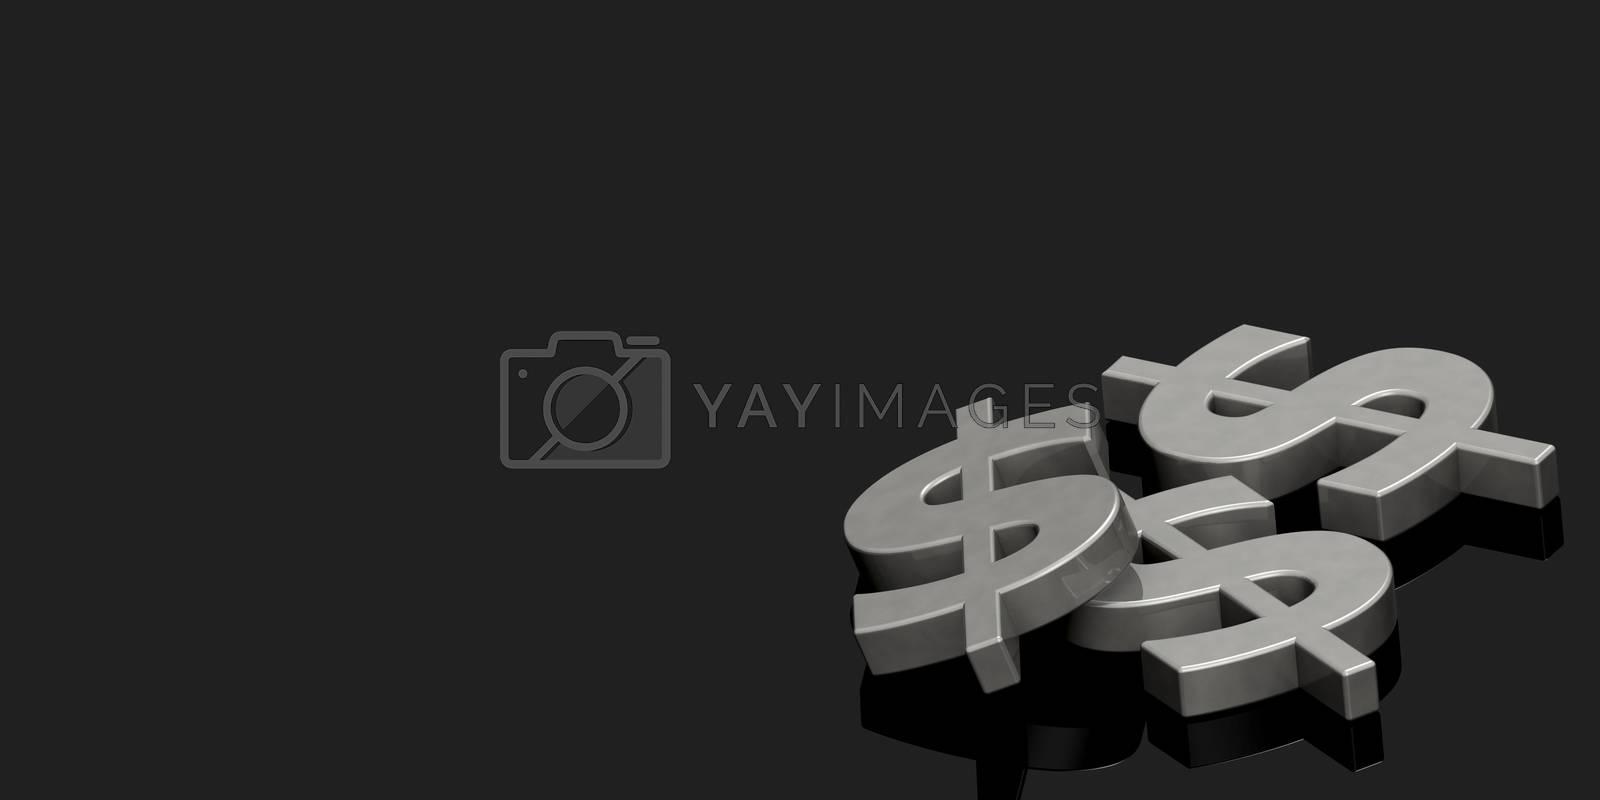 Metallic dollar sign, financial concept, 3D rendering